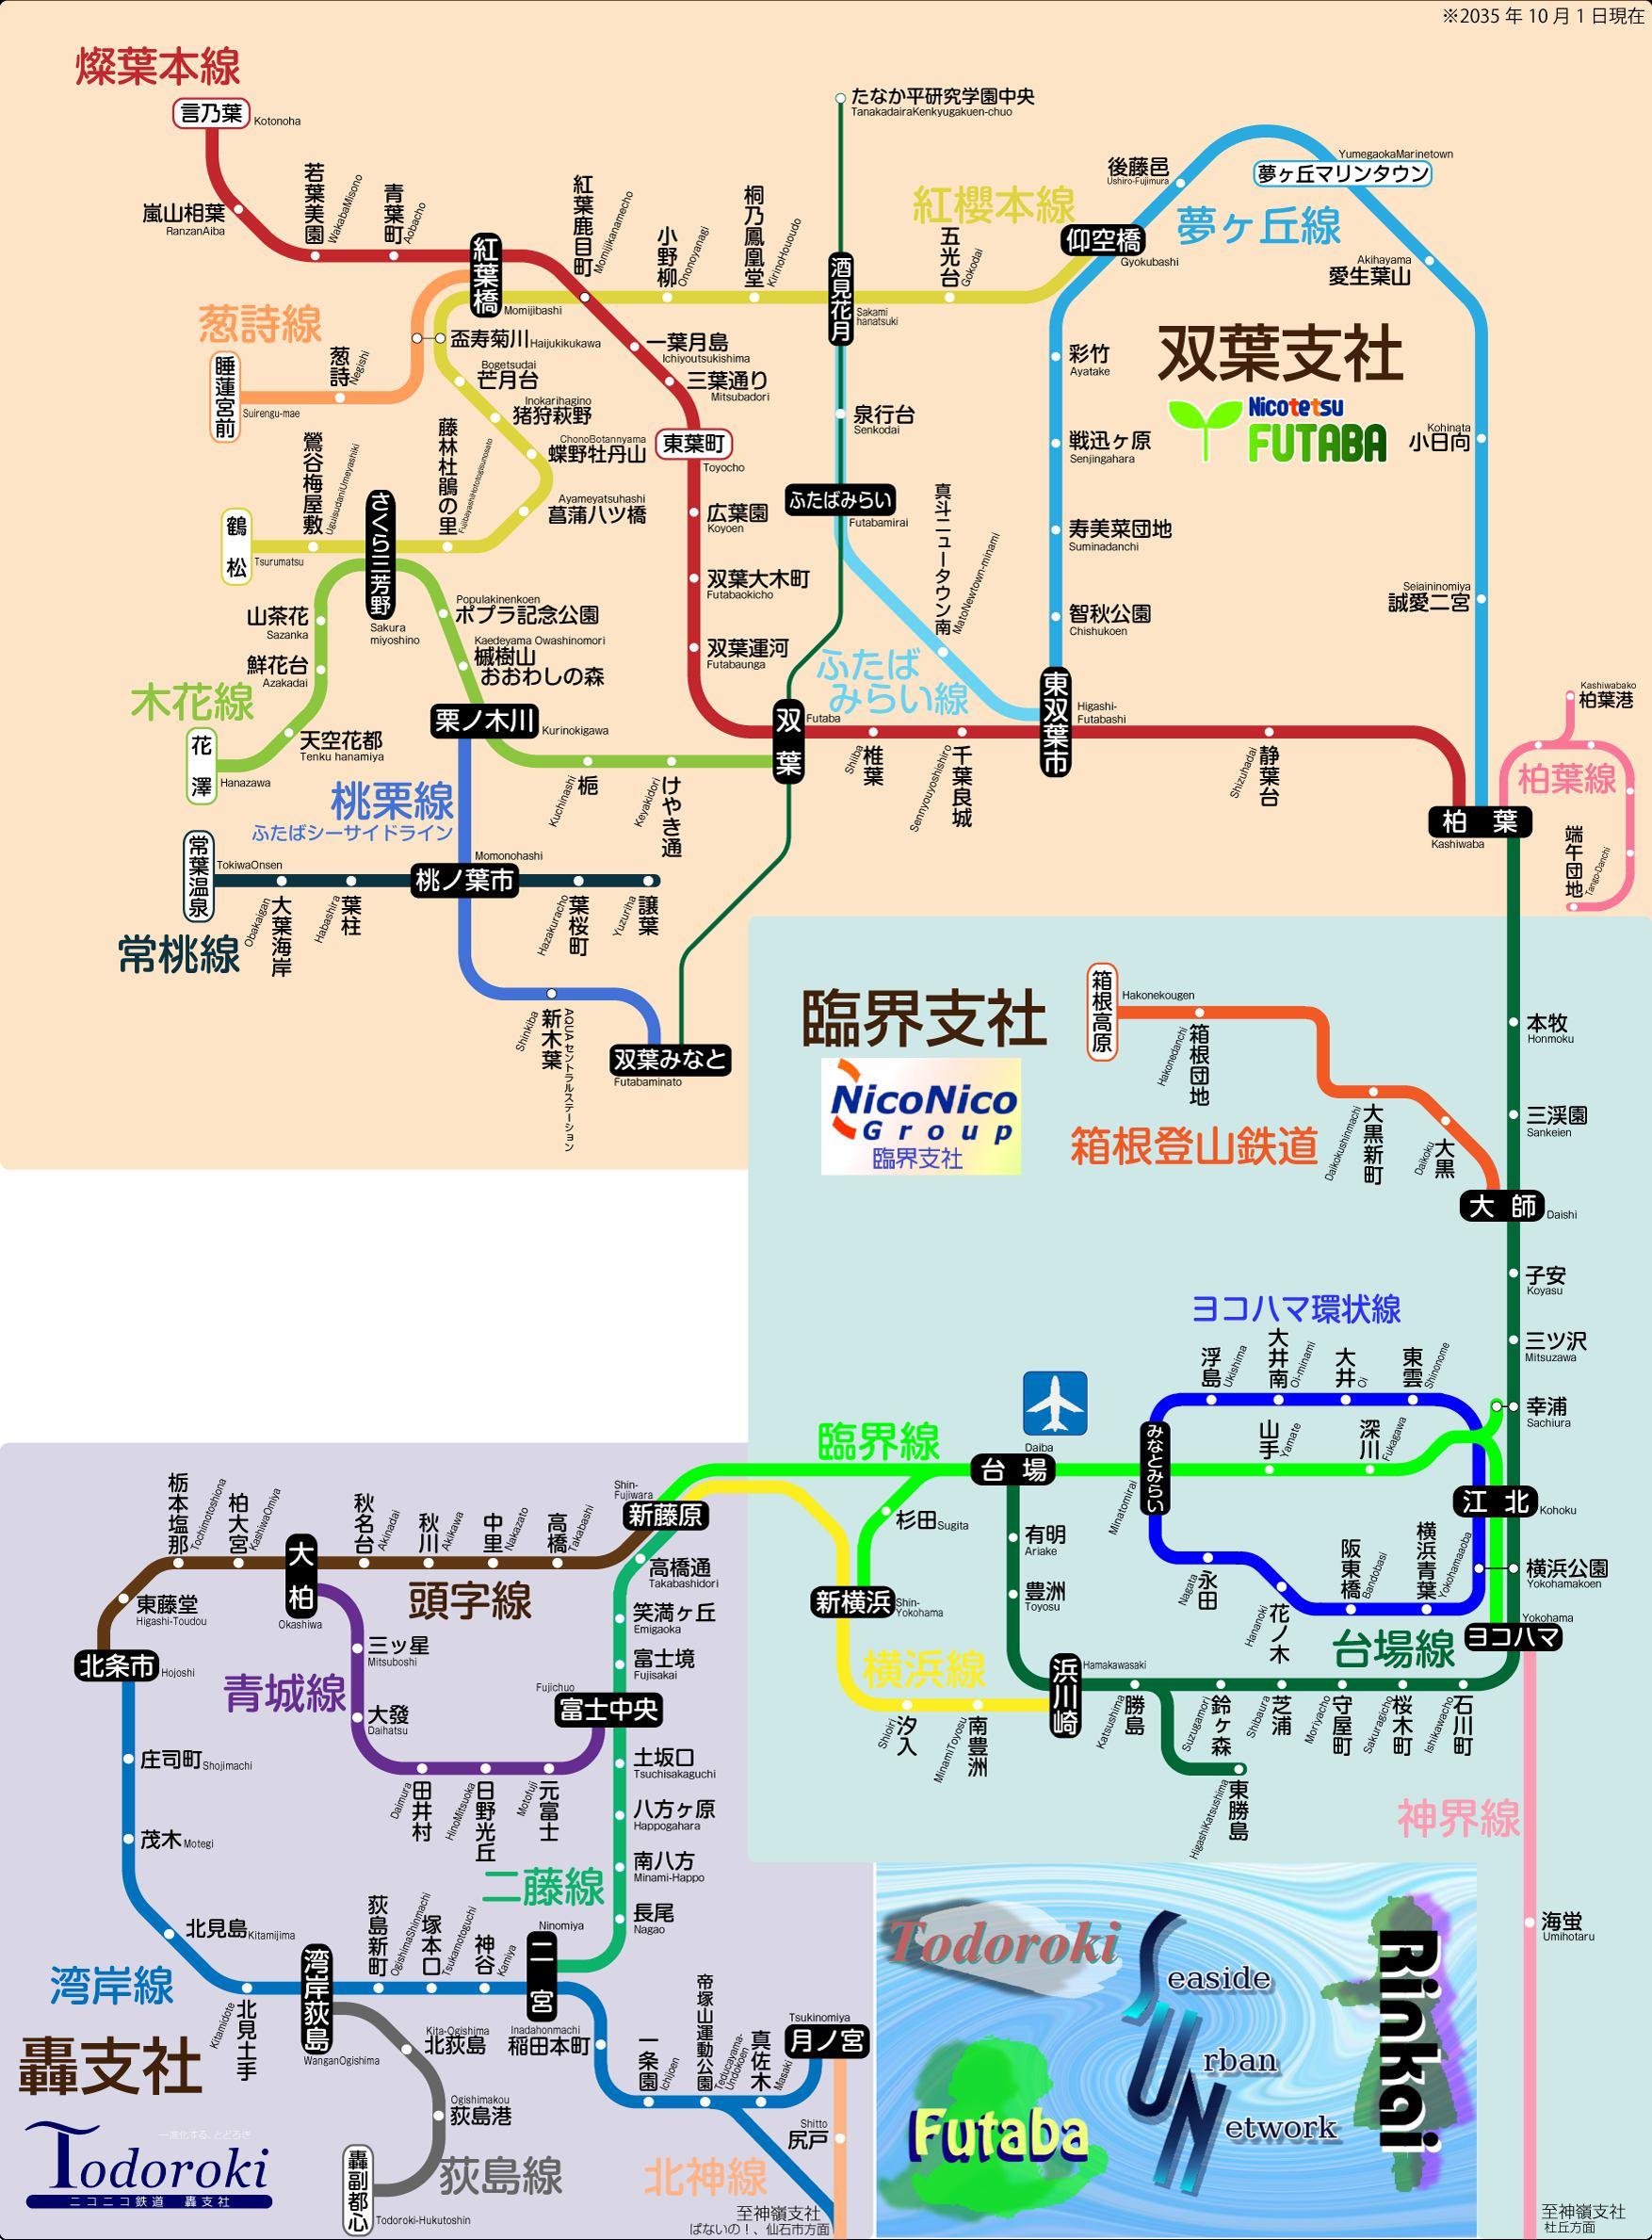 SUN広域路線図wiki4.jpg